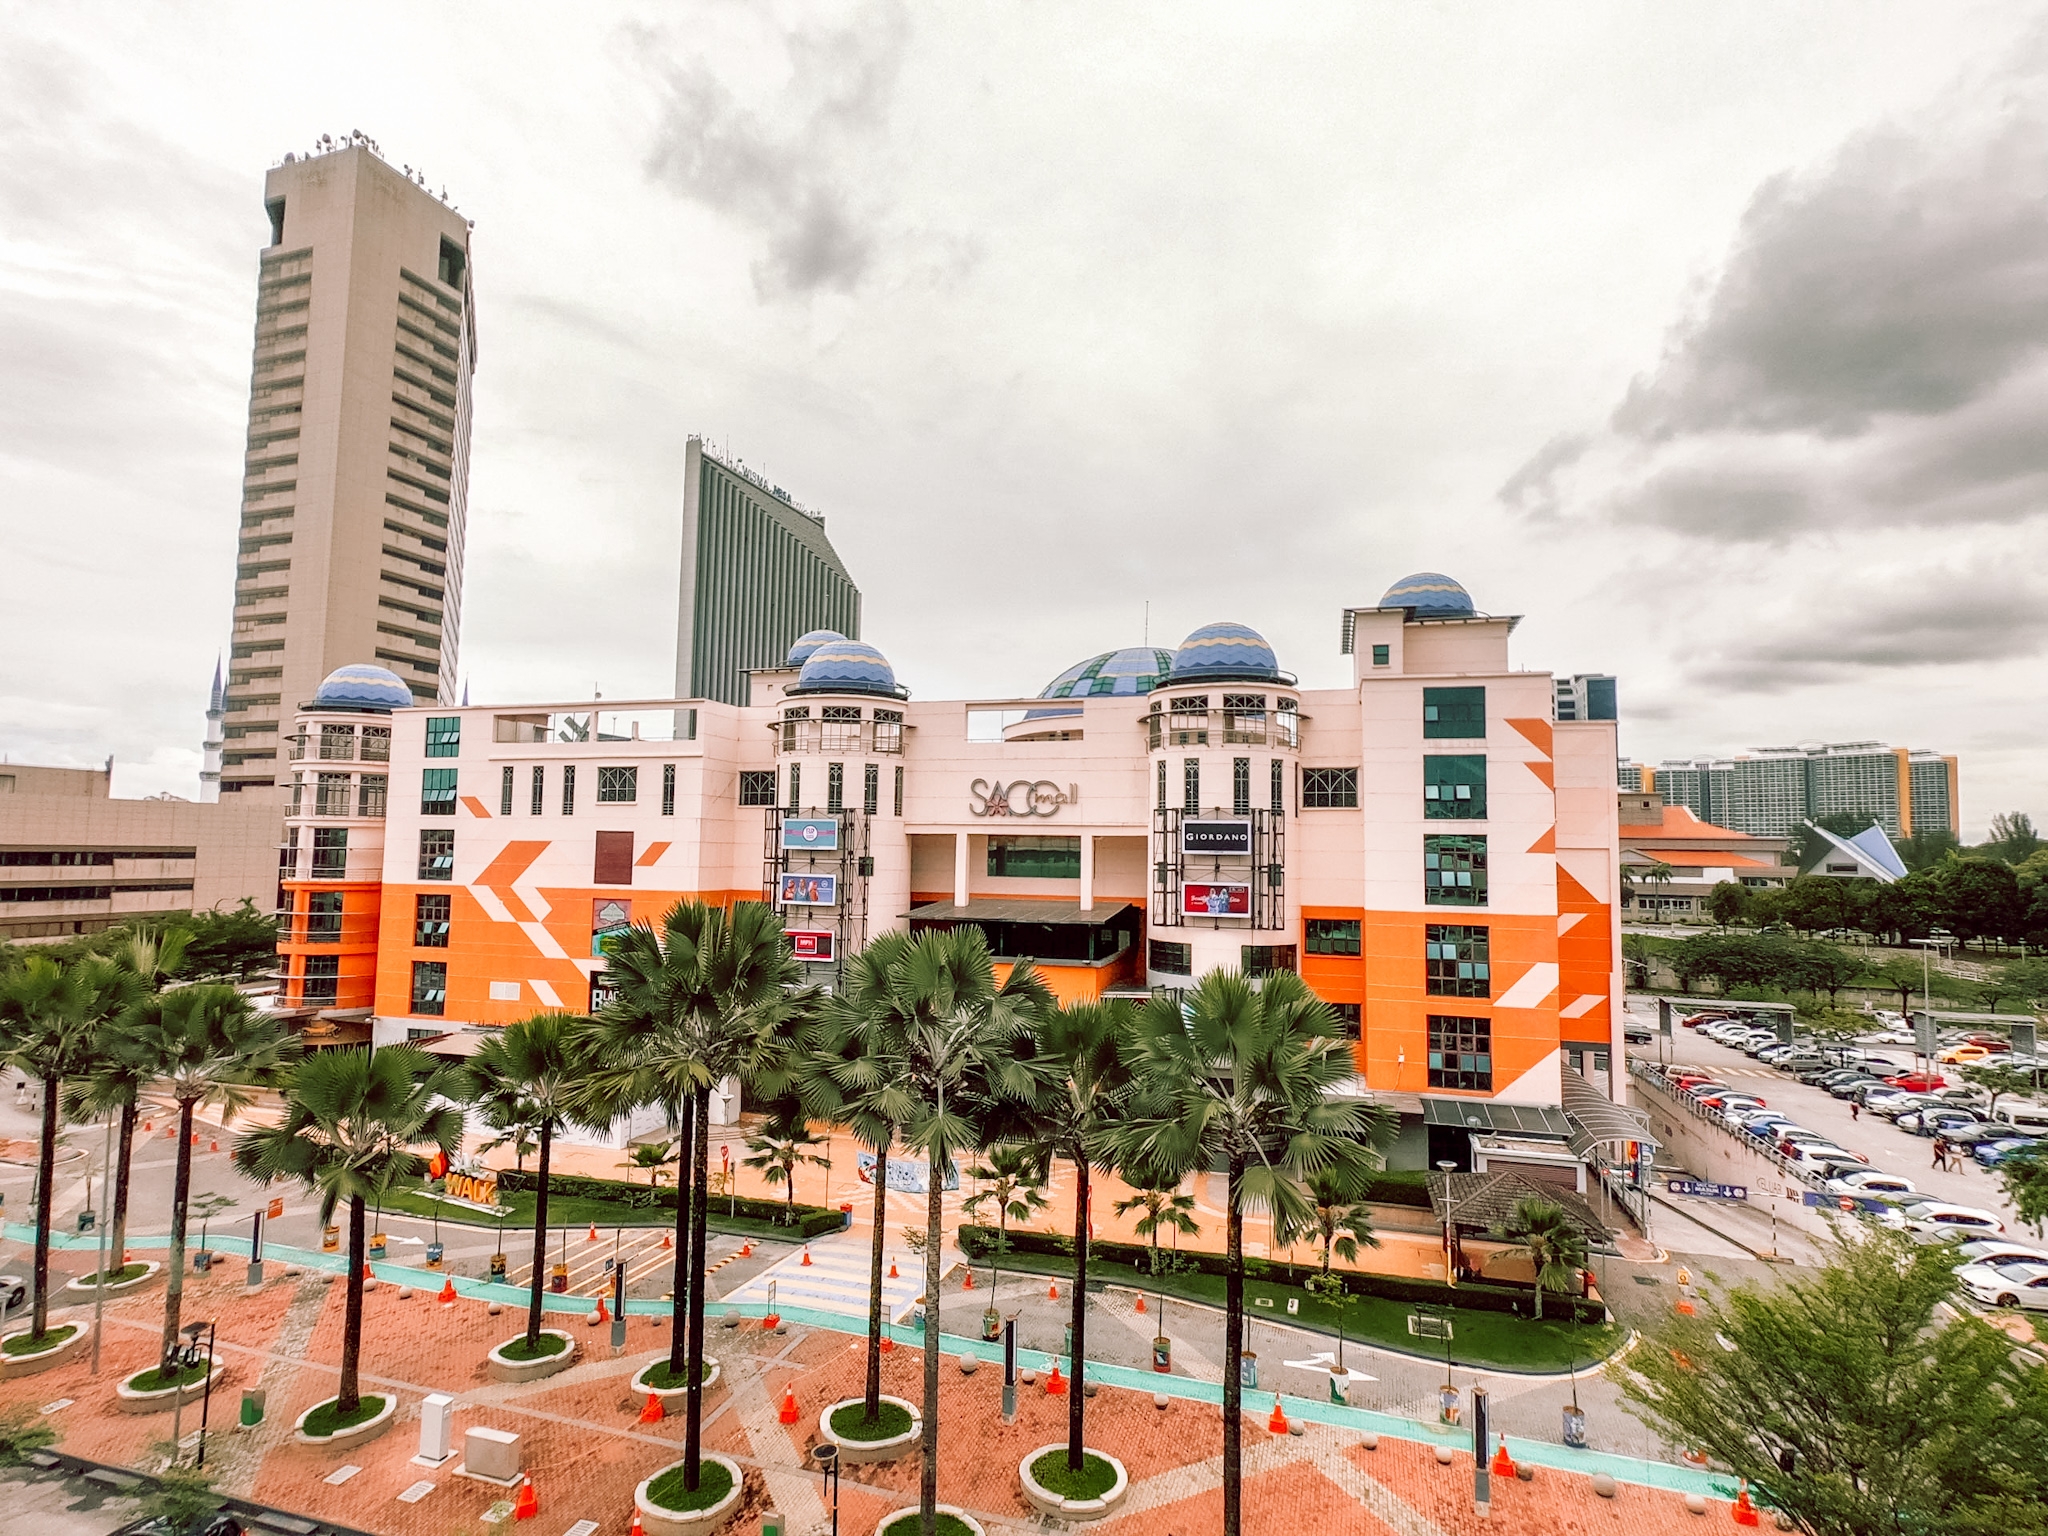 SACC Mall Shah Alam diiktiraf sebagai Zon Perdagangan Terpilih (ZPT)